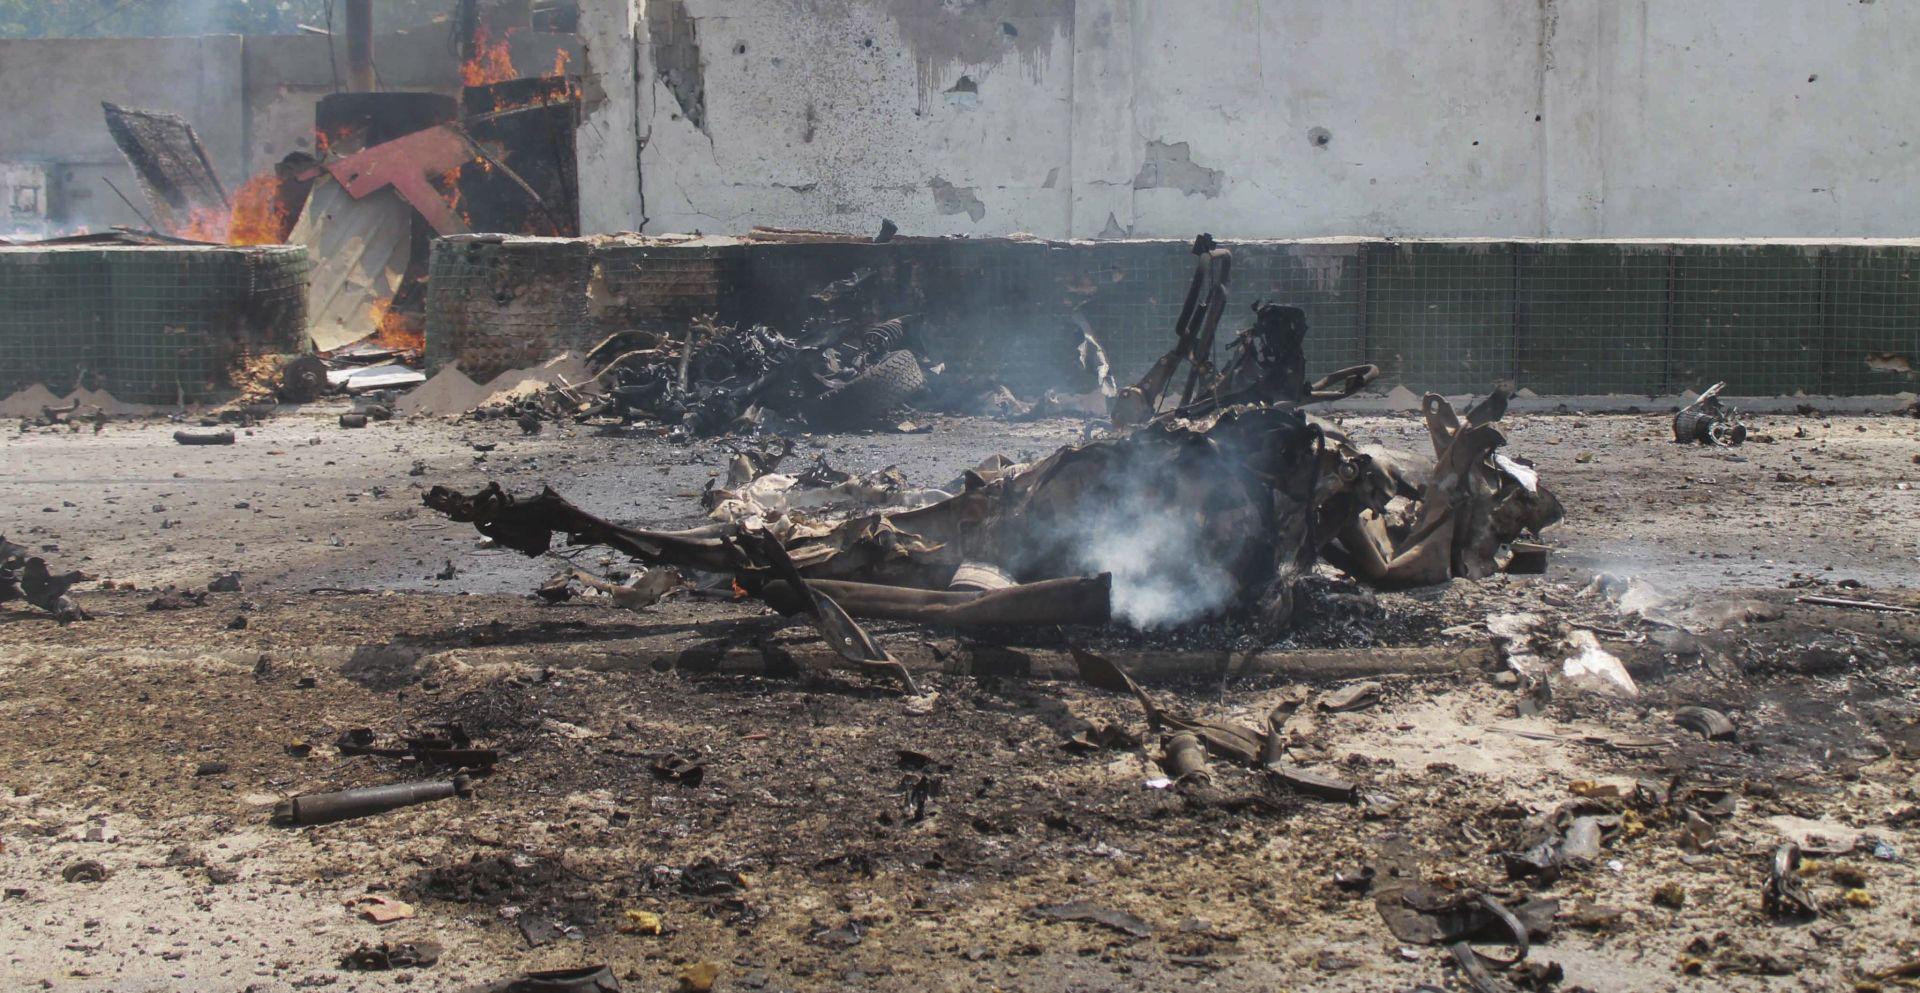 NAPAD ISLAMSKE DRŽAVE Eksplozija kamion bombe u Iraku, gotovo 80 mrtvih